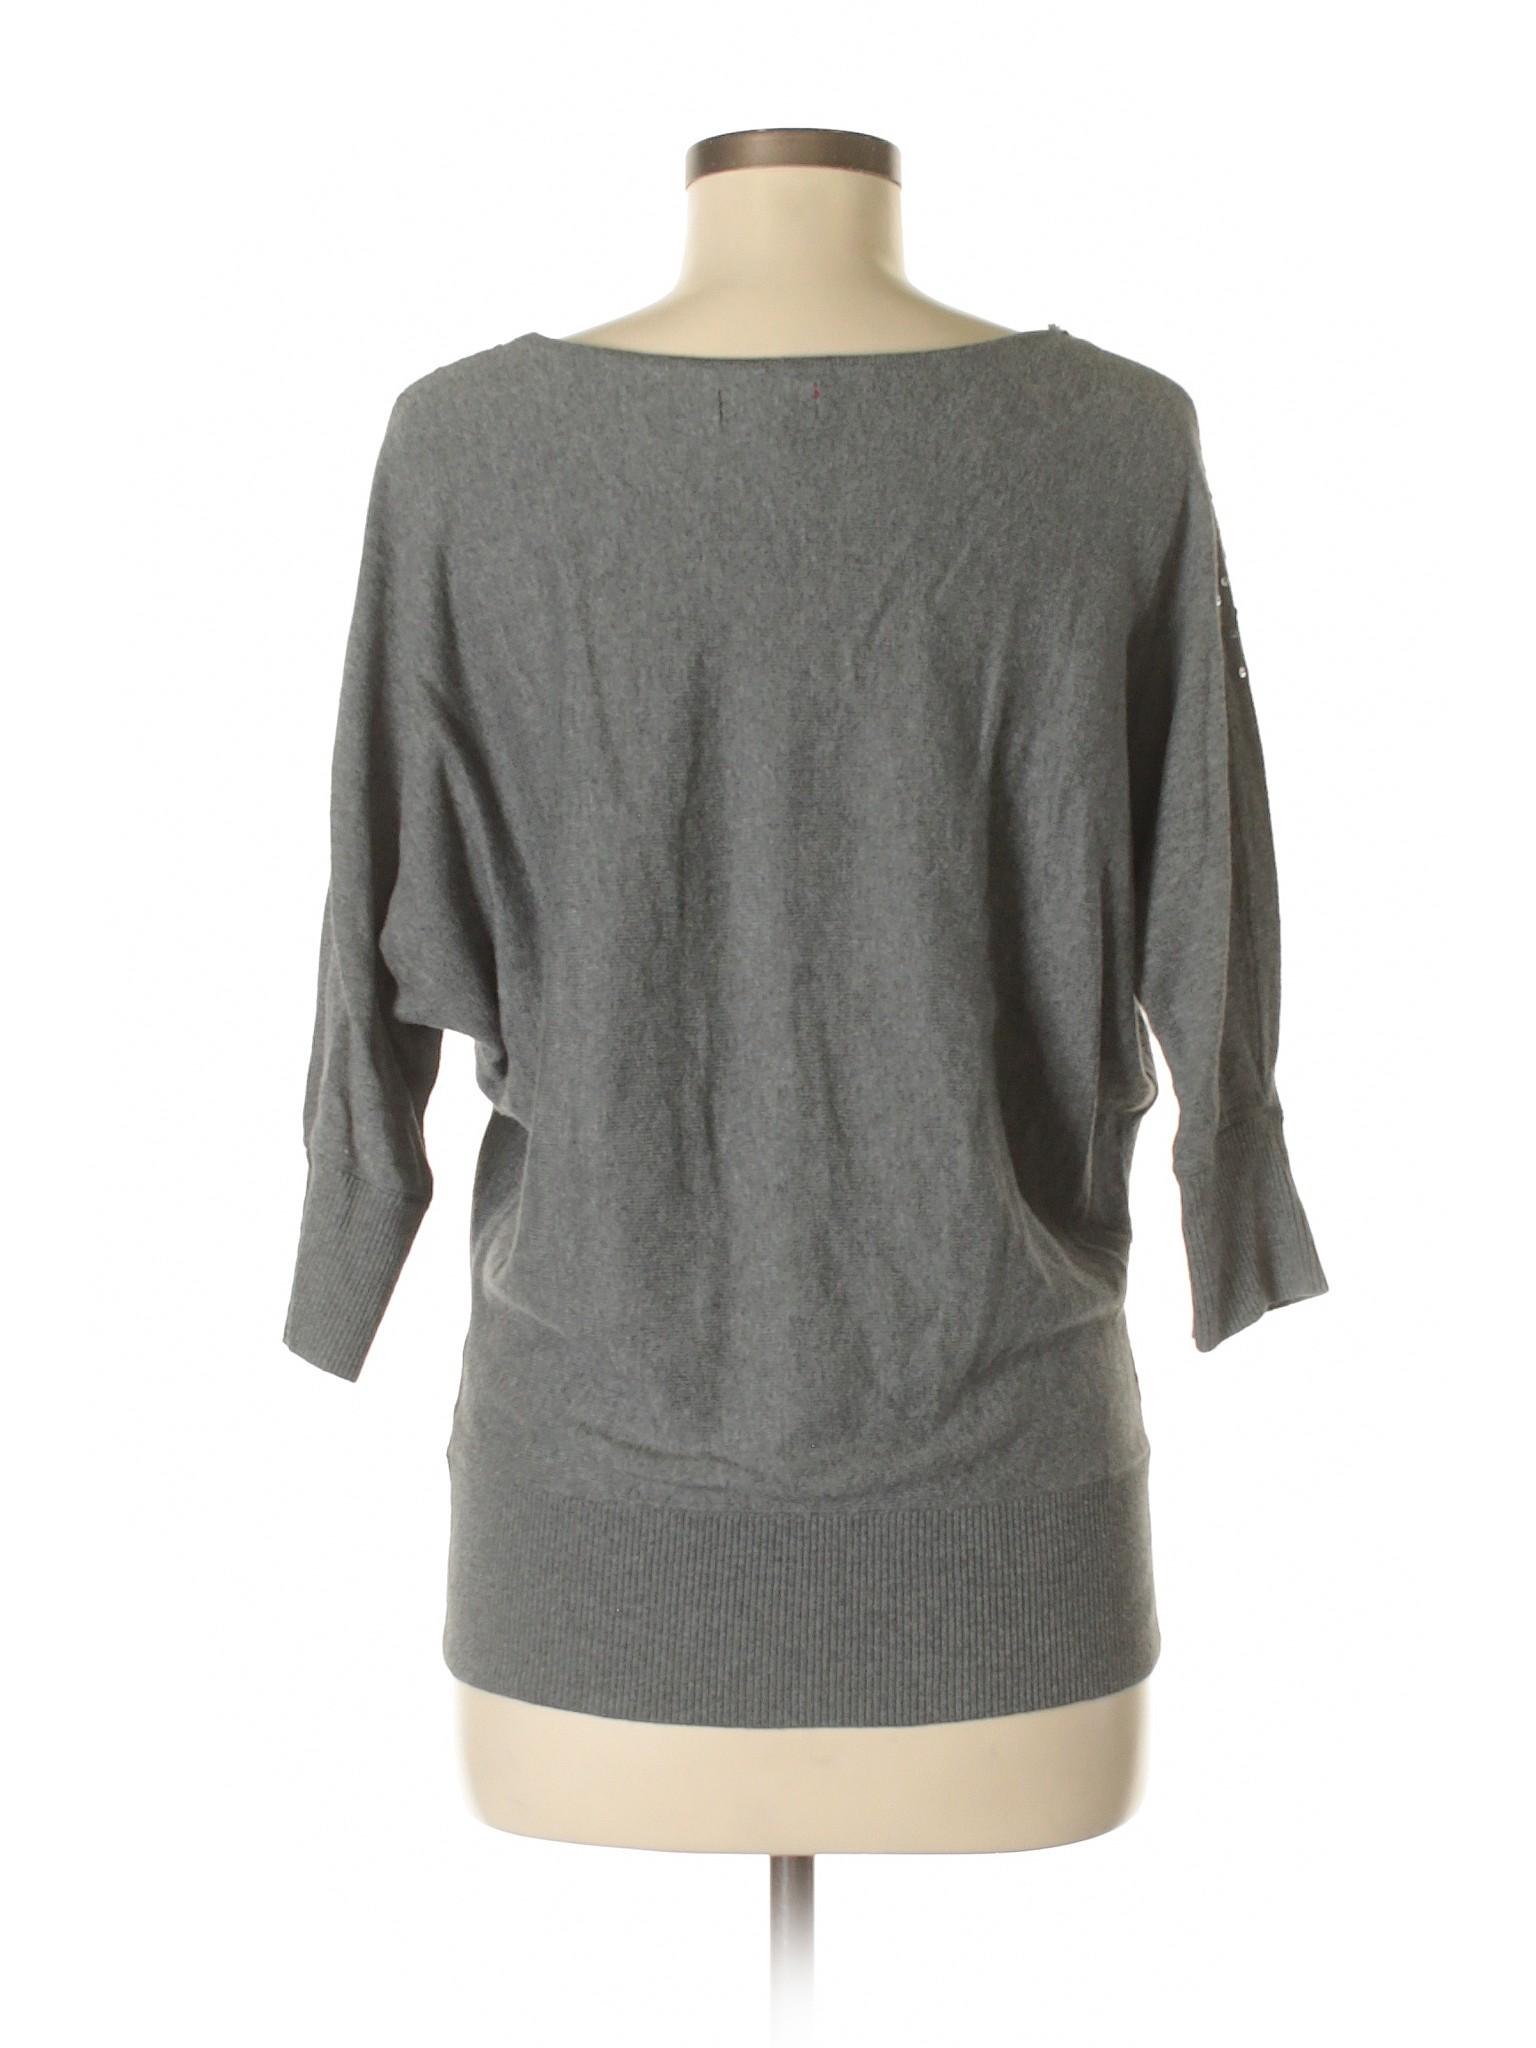 winter Pullover Sweater Elle Elle Boutique Sweater Pullover winter Boutique 0XAP4Aq